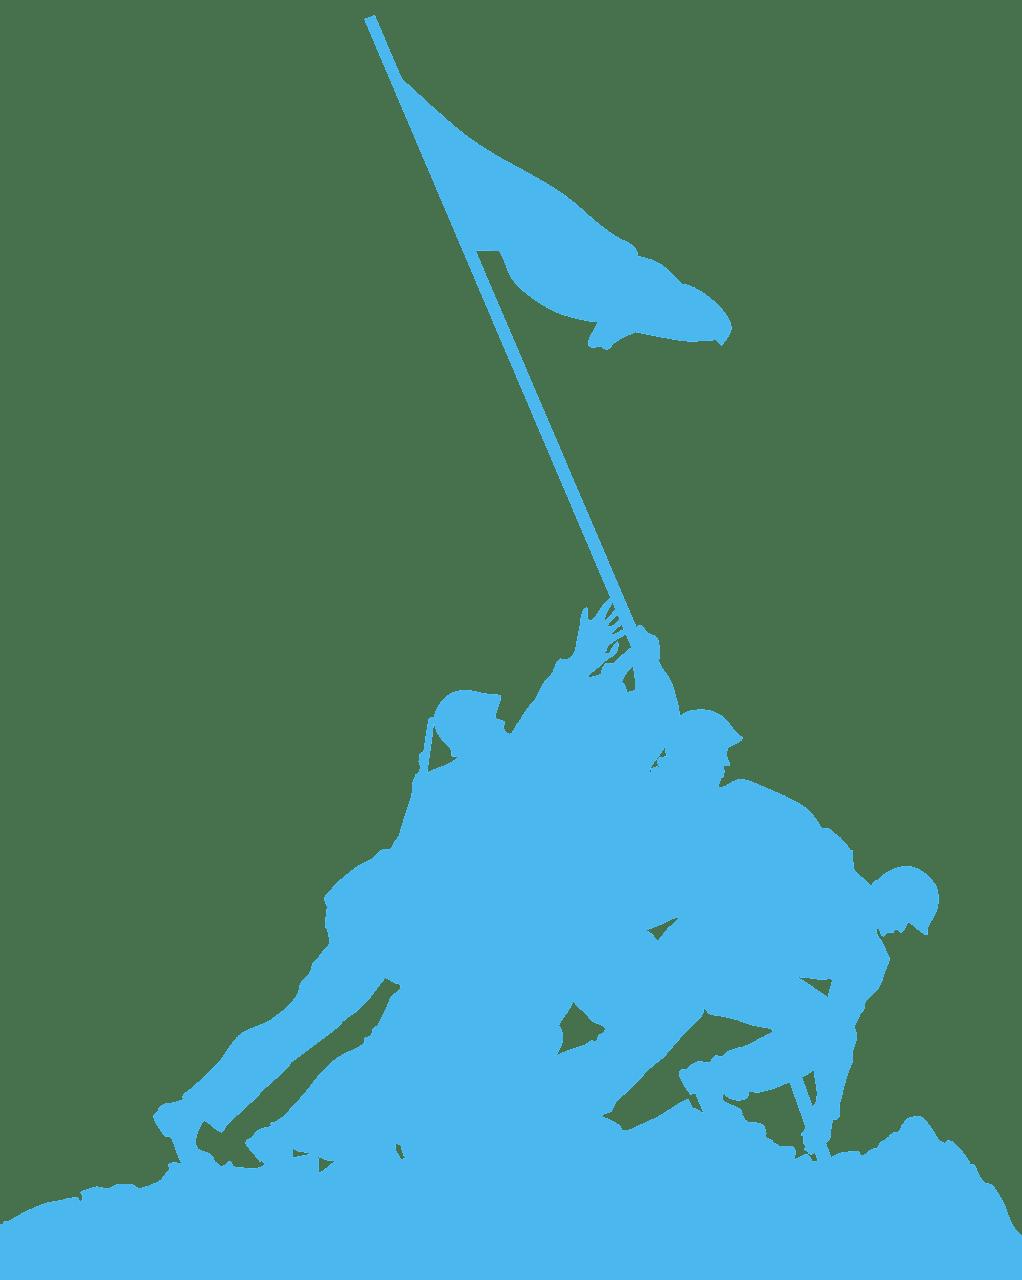 Iwo Jima silhouette.